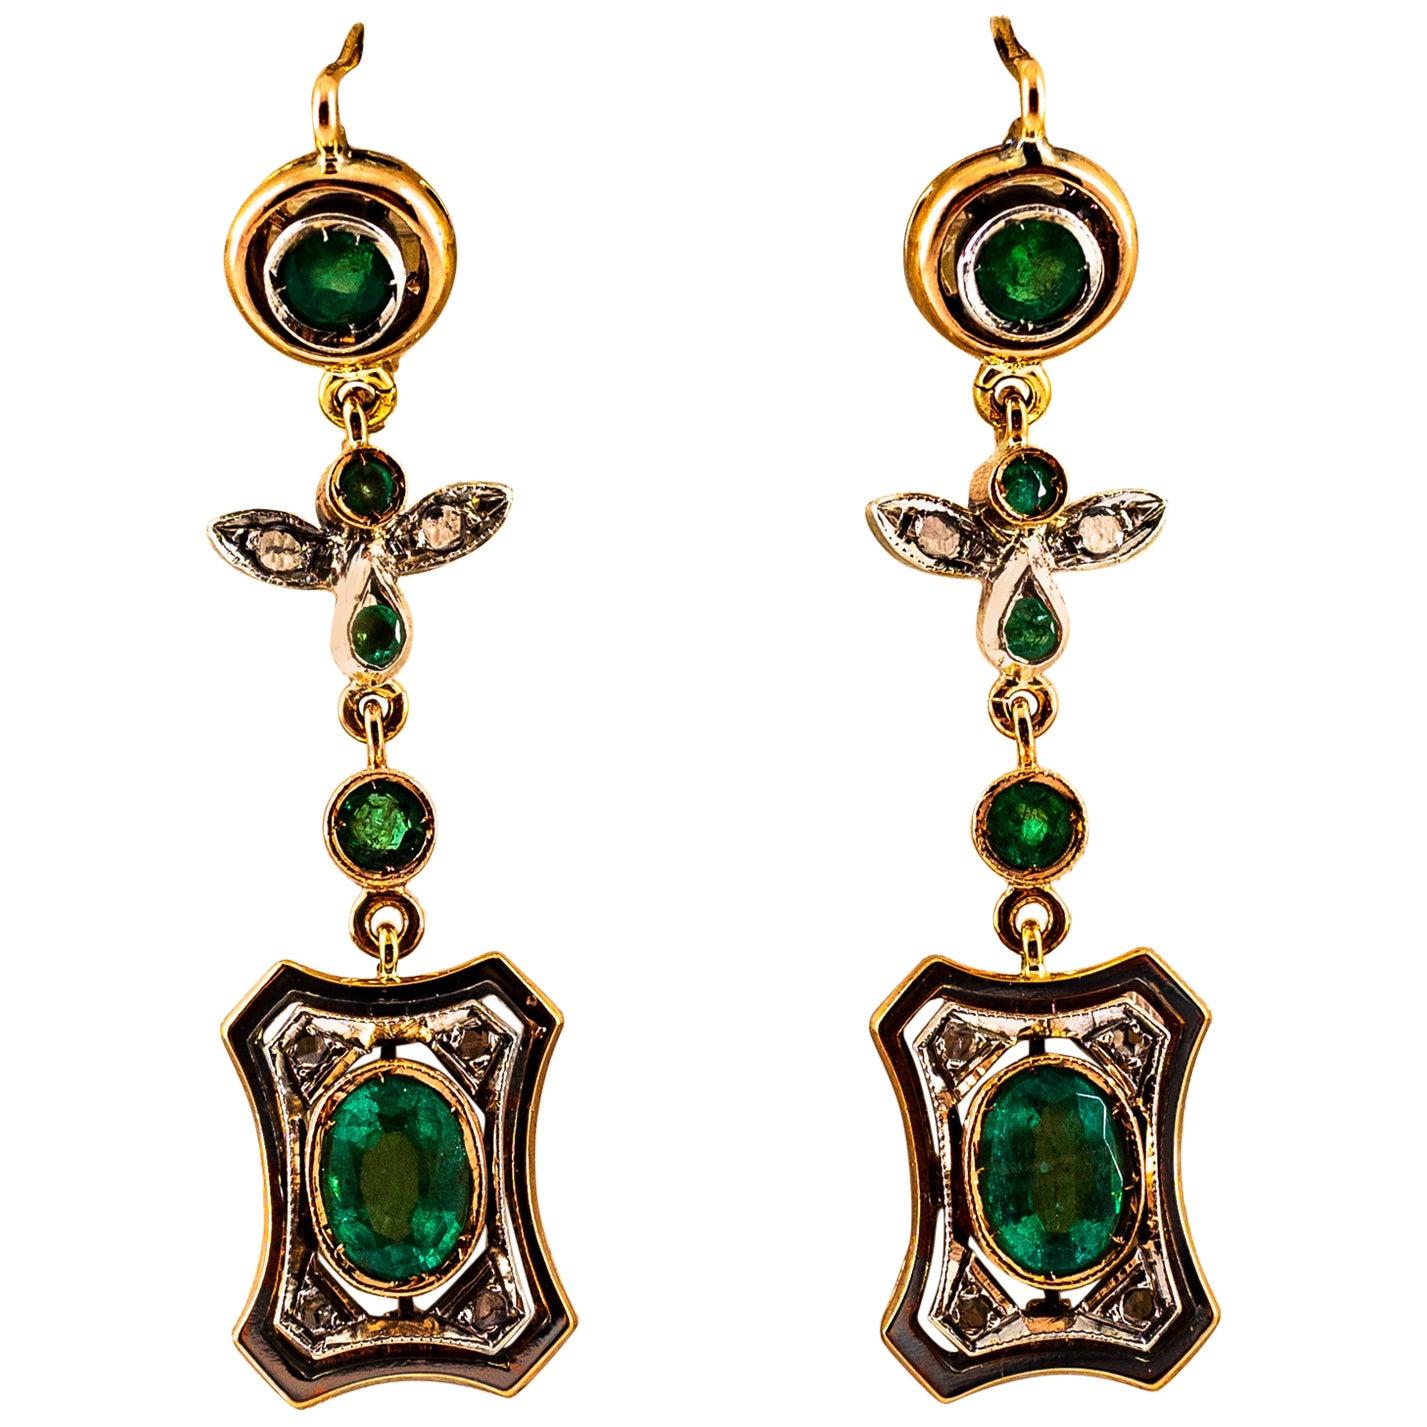 Art Deco Style 2.60 Carat White Rose Cut Diamond Emerald Yellow Gold Earrings